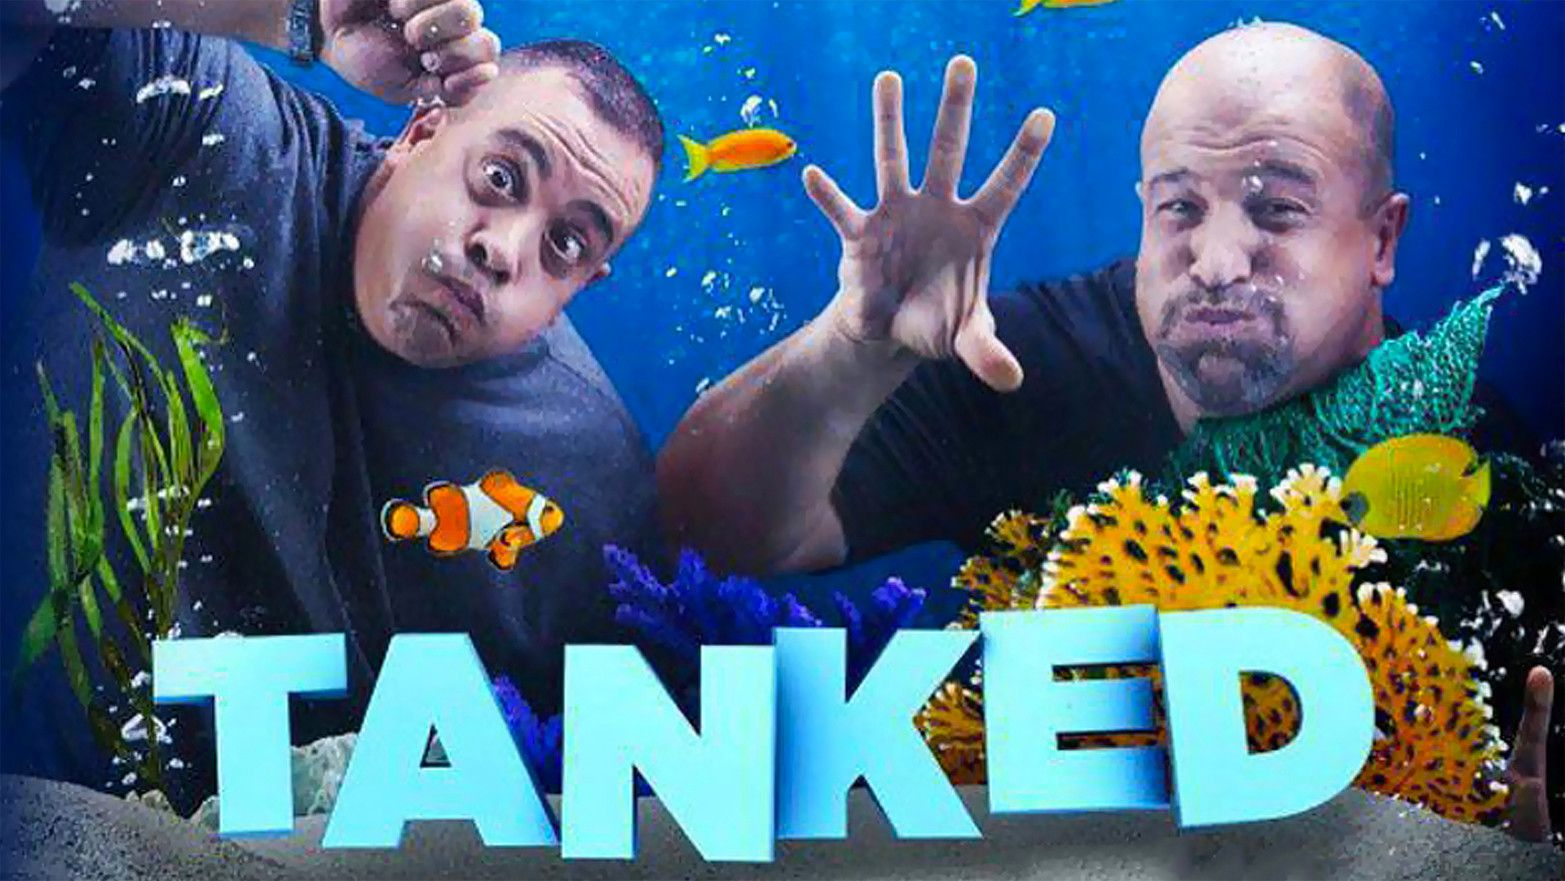 Animal Animal Tank, Tv stars